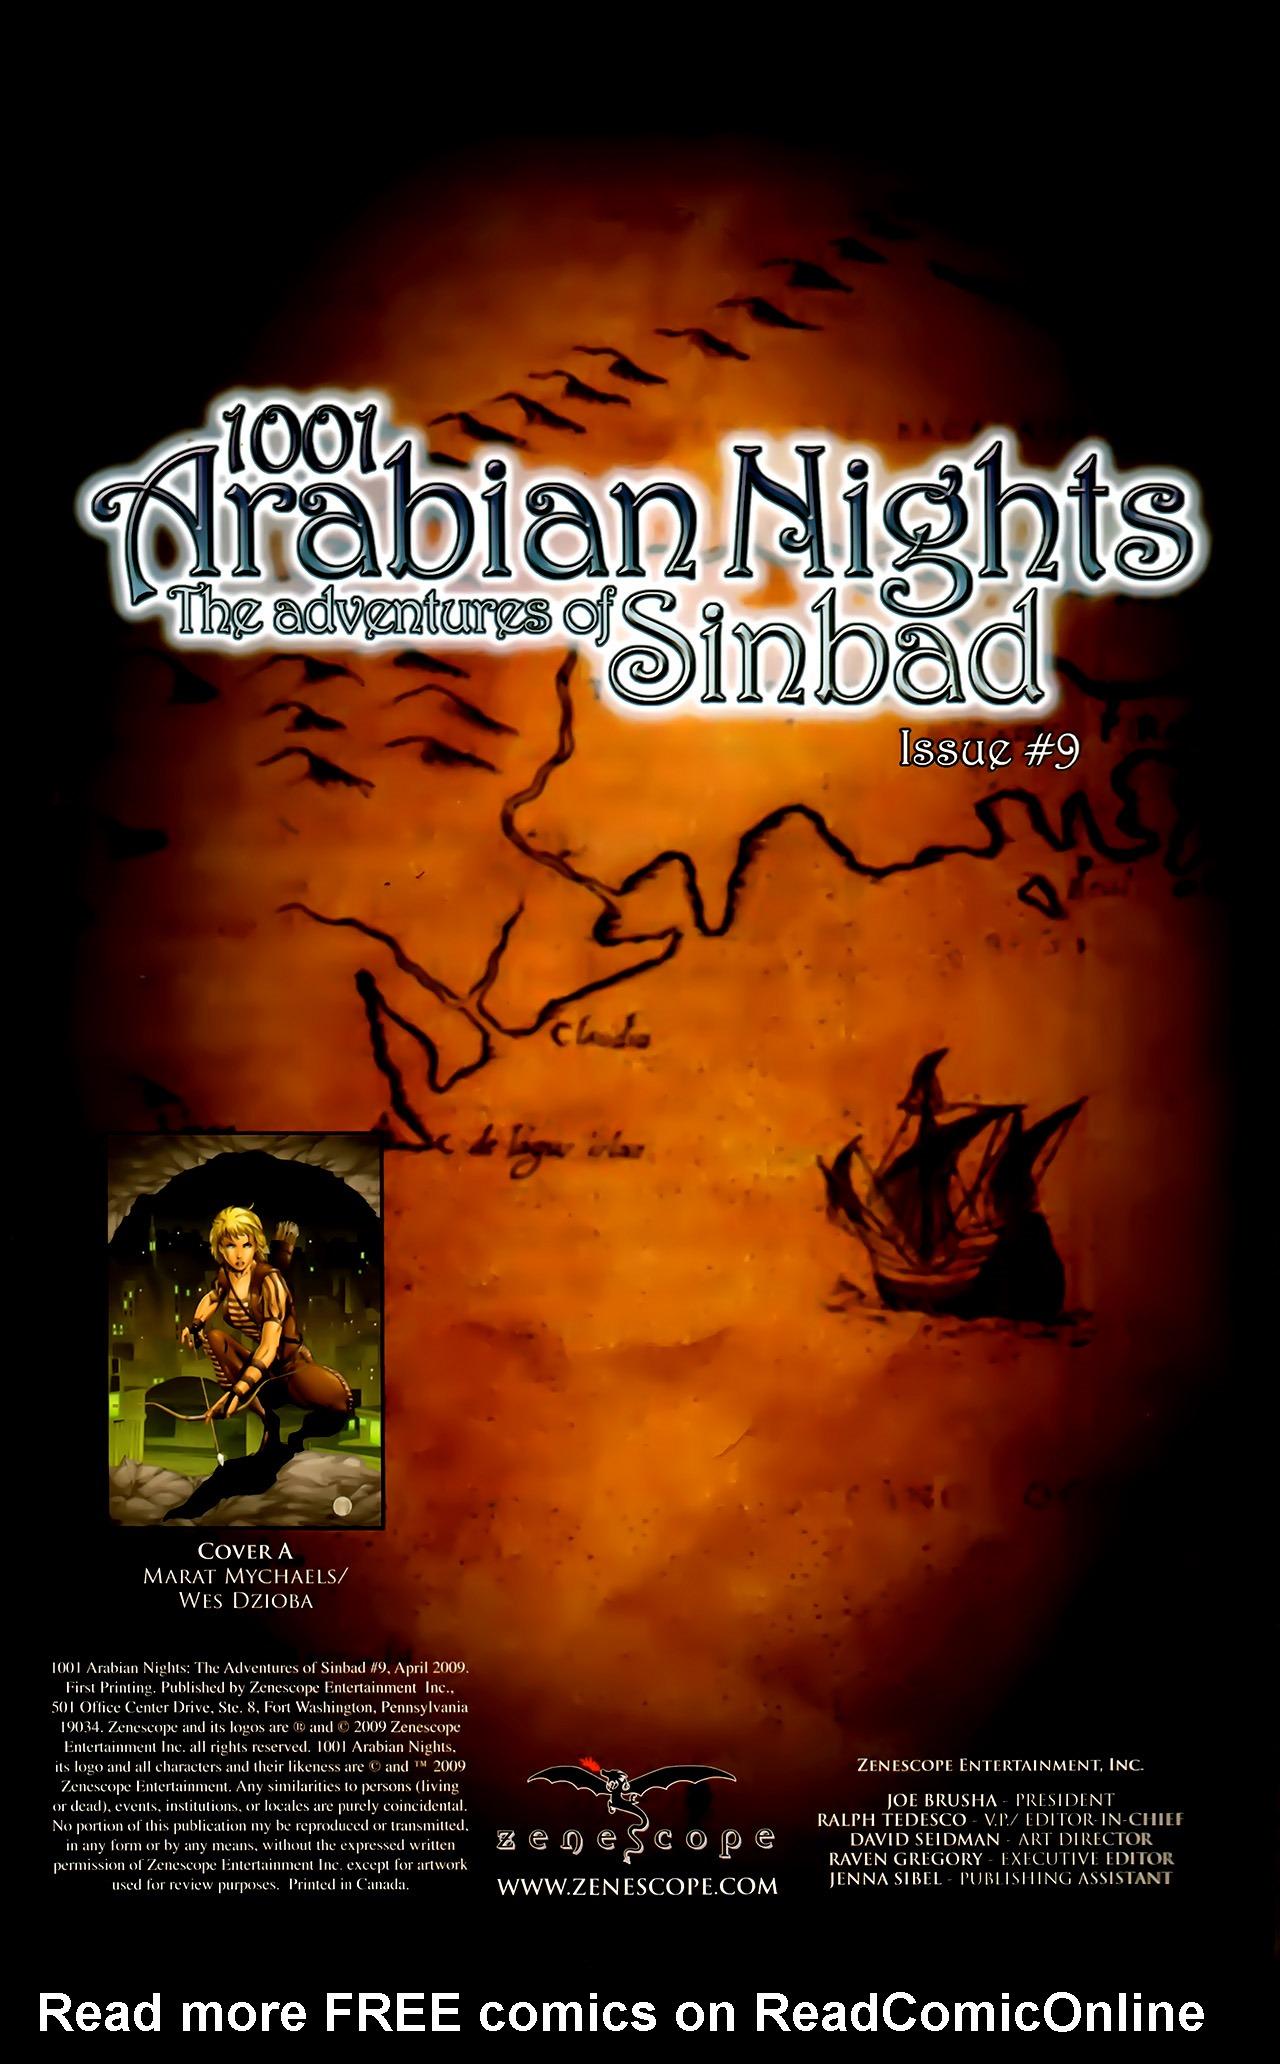 Read online 1001 Arabian Nights: The Adventures of Sinbad comic -  Issue #9 - 2